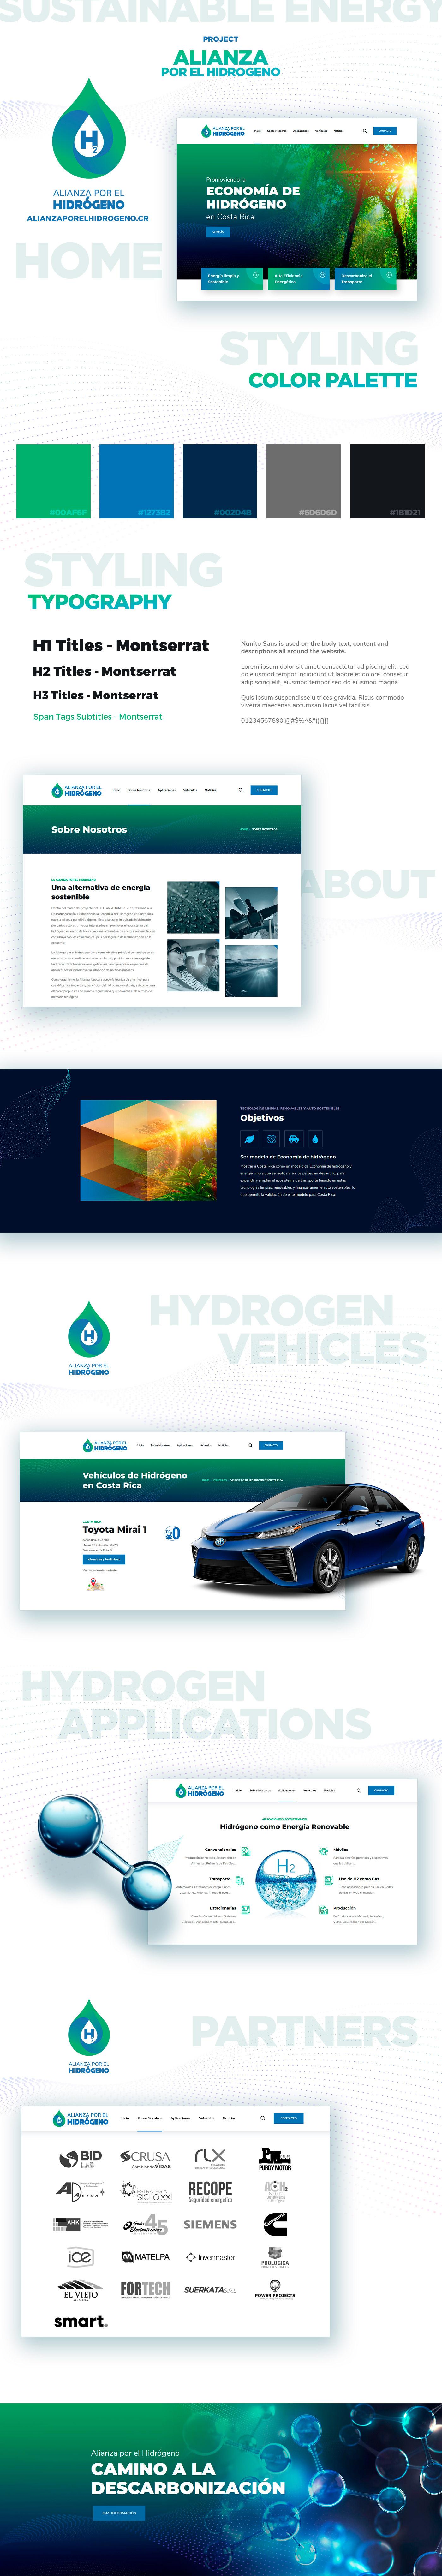 alianza clean Green Energy hidrogeno Hydrogen Website future graphic design  ux/ui Web Design